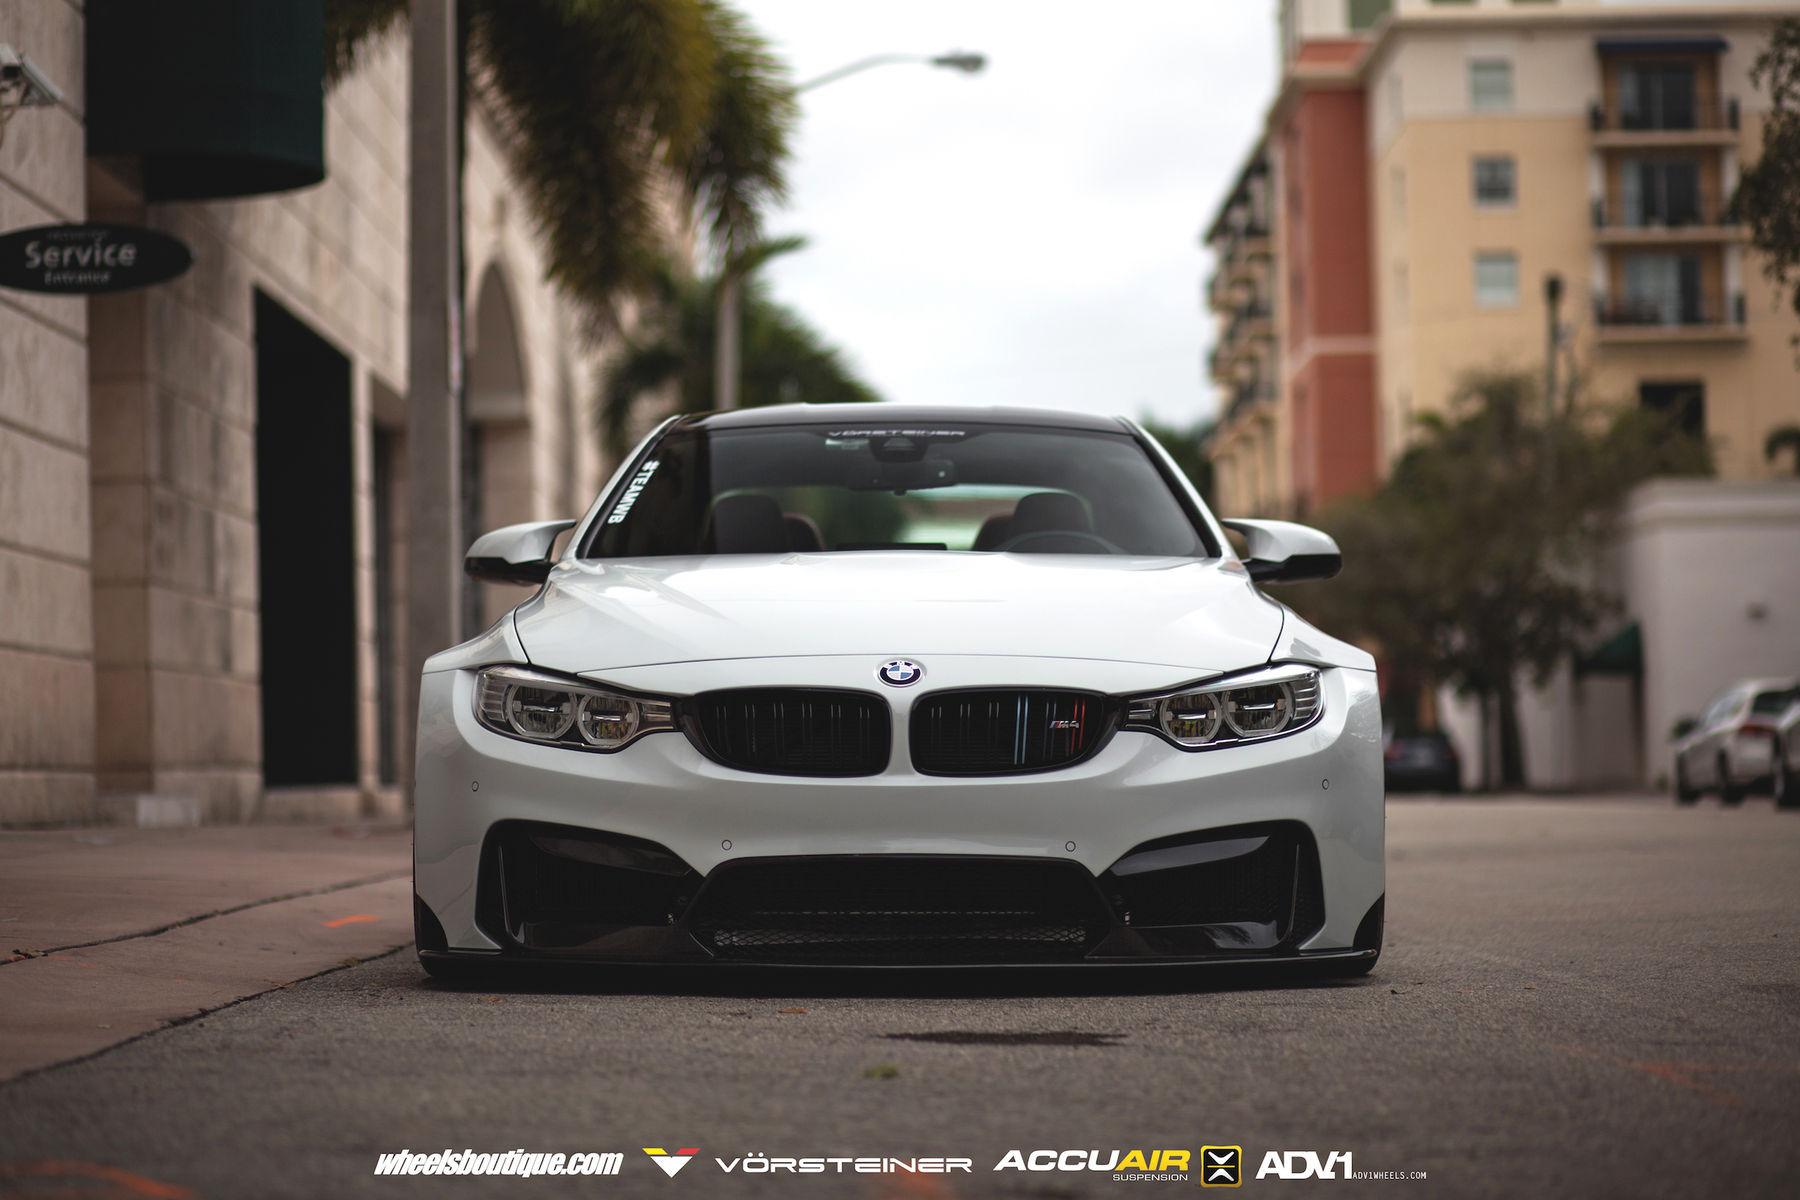 2015 BMW M4 | Widebody BMW M4